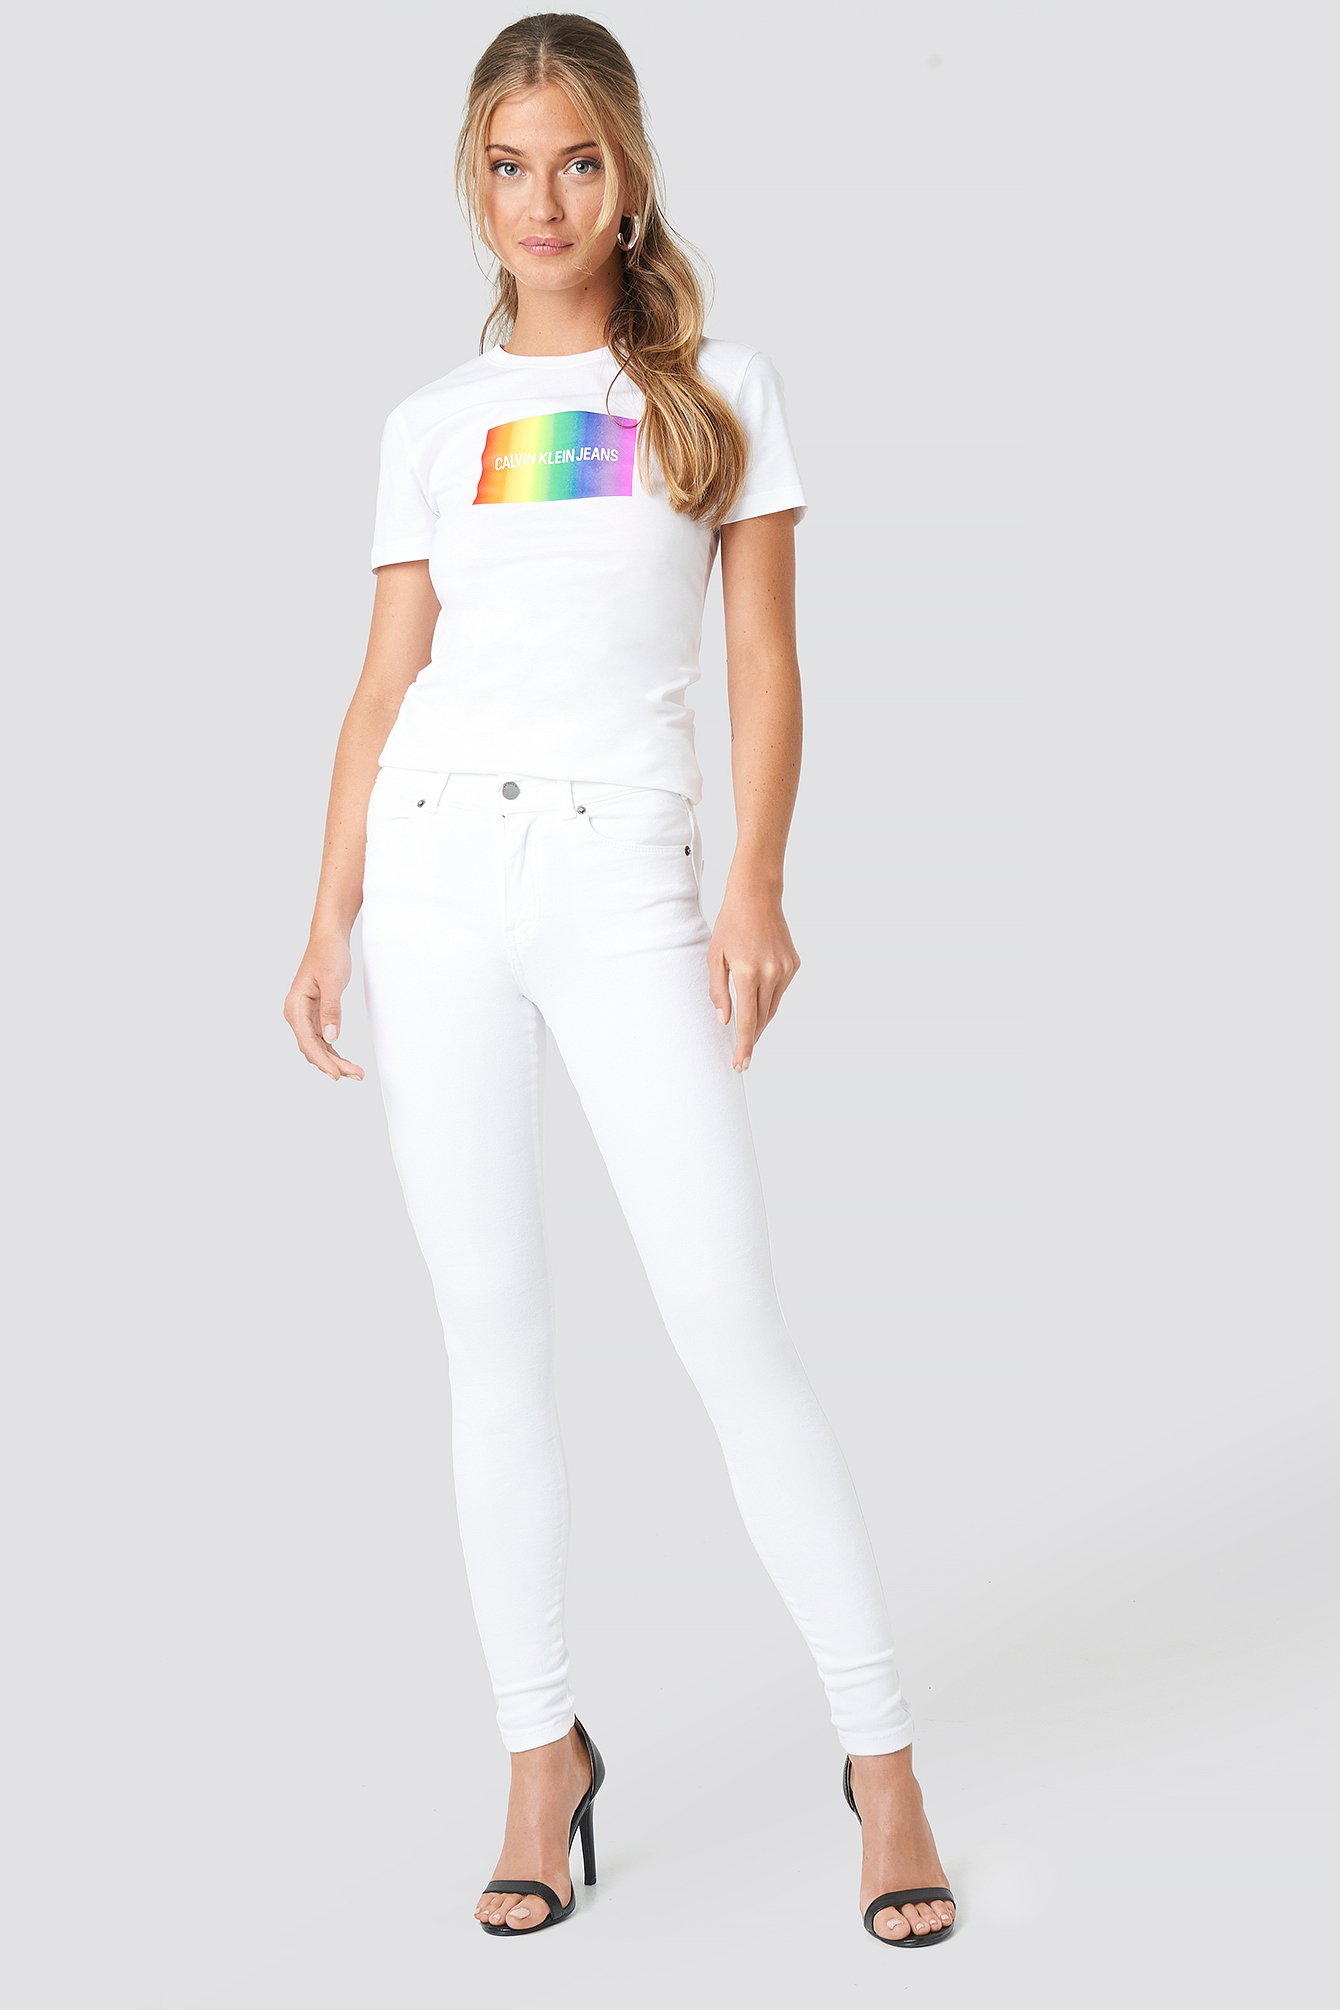 dr denim -  Lexy Jeans - White